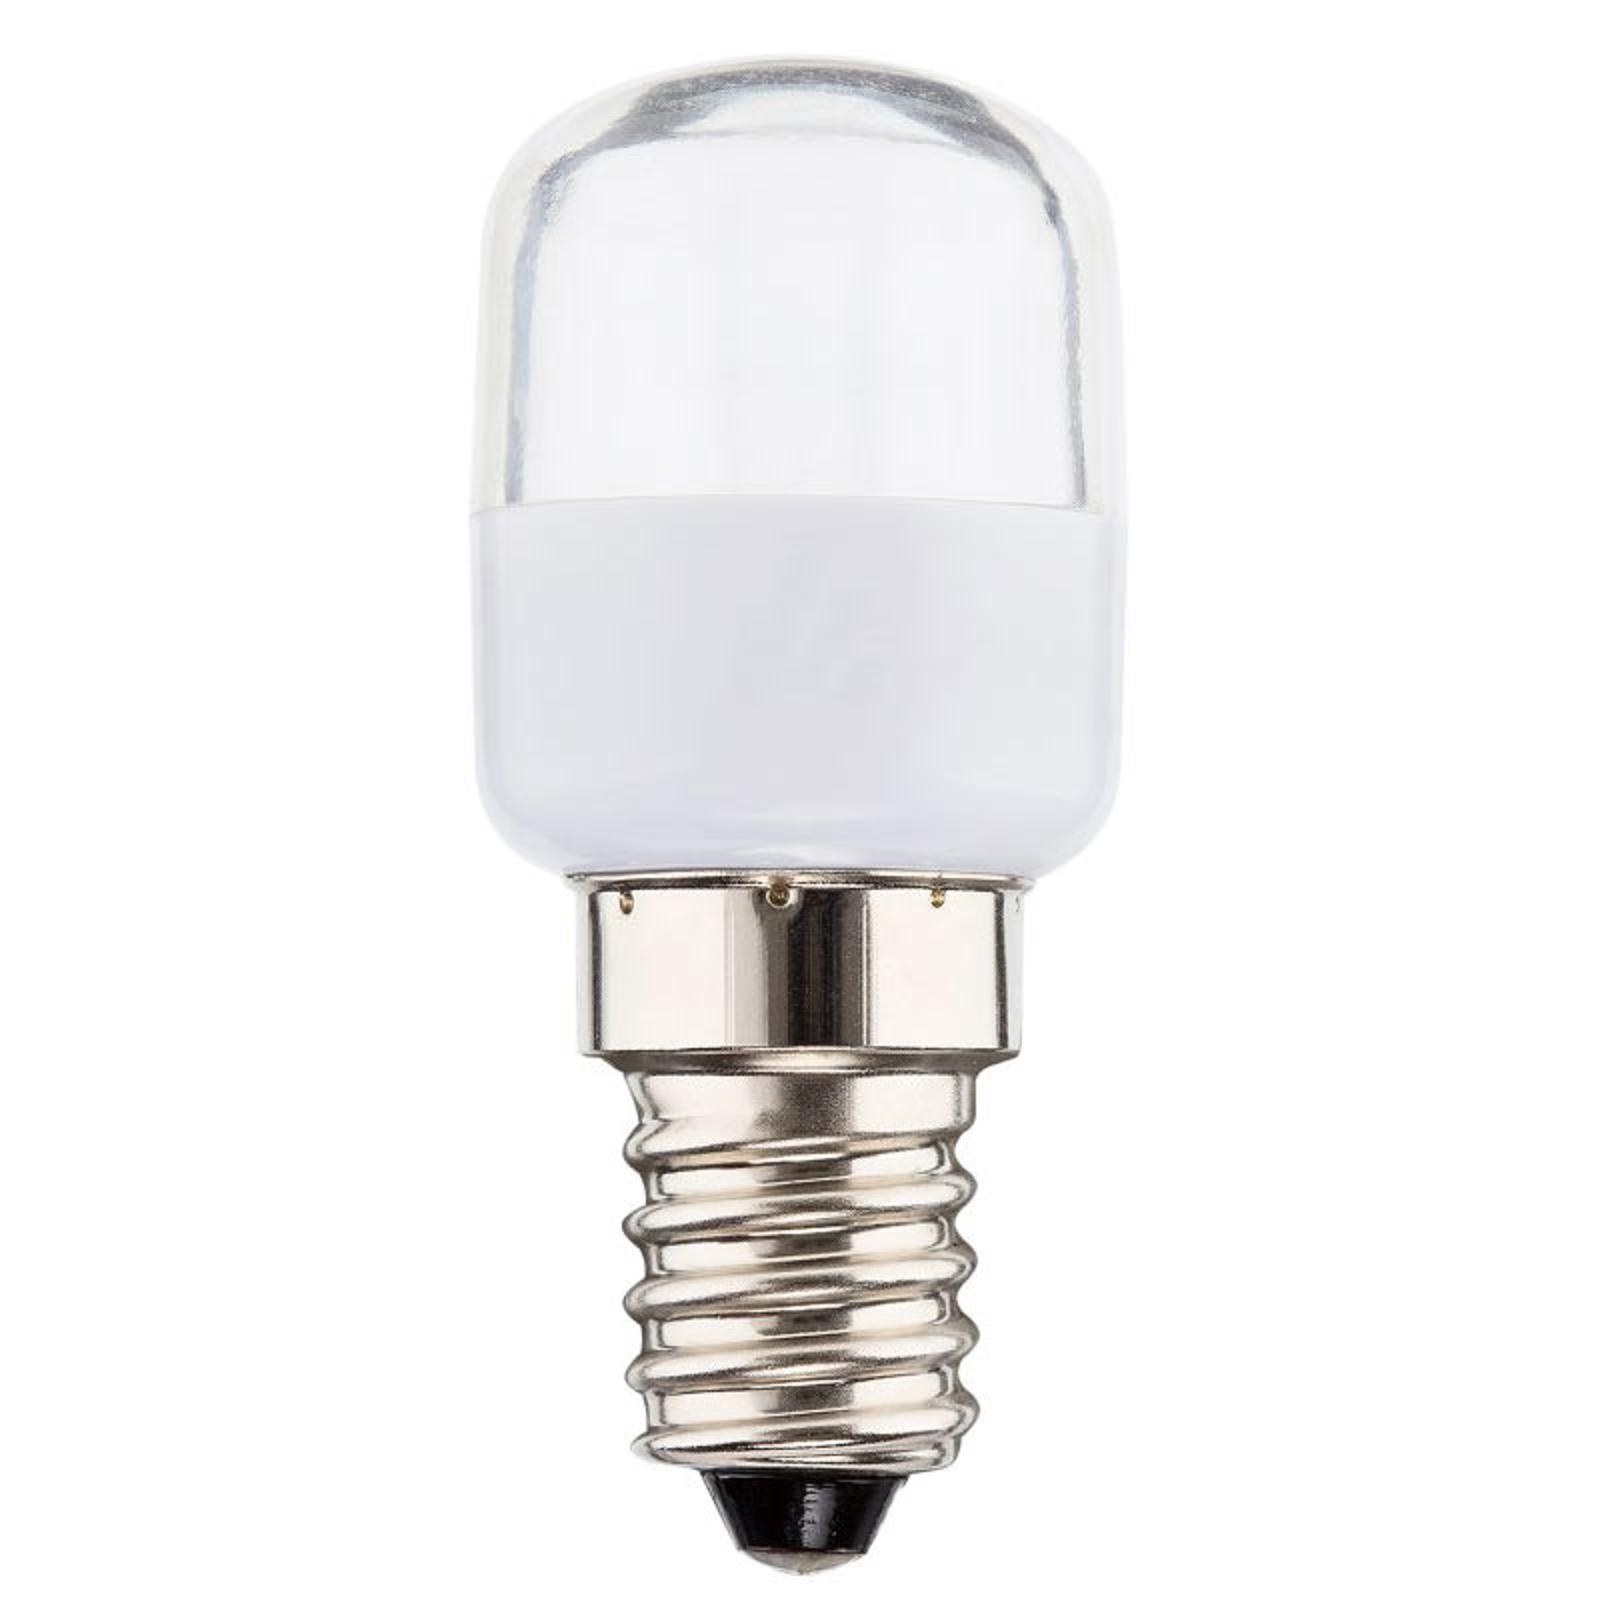 LED-Kühlschranklampe E14 2,5 W warmweiß 180 Lumen